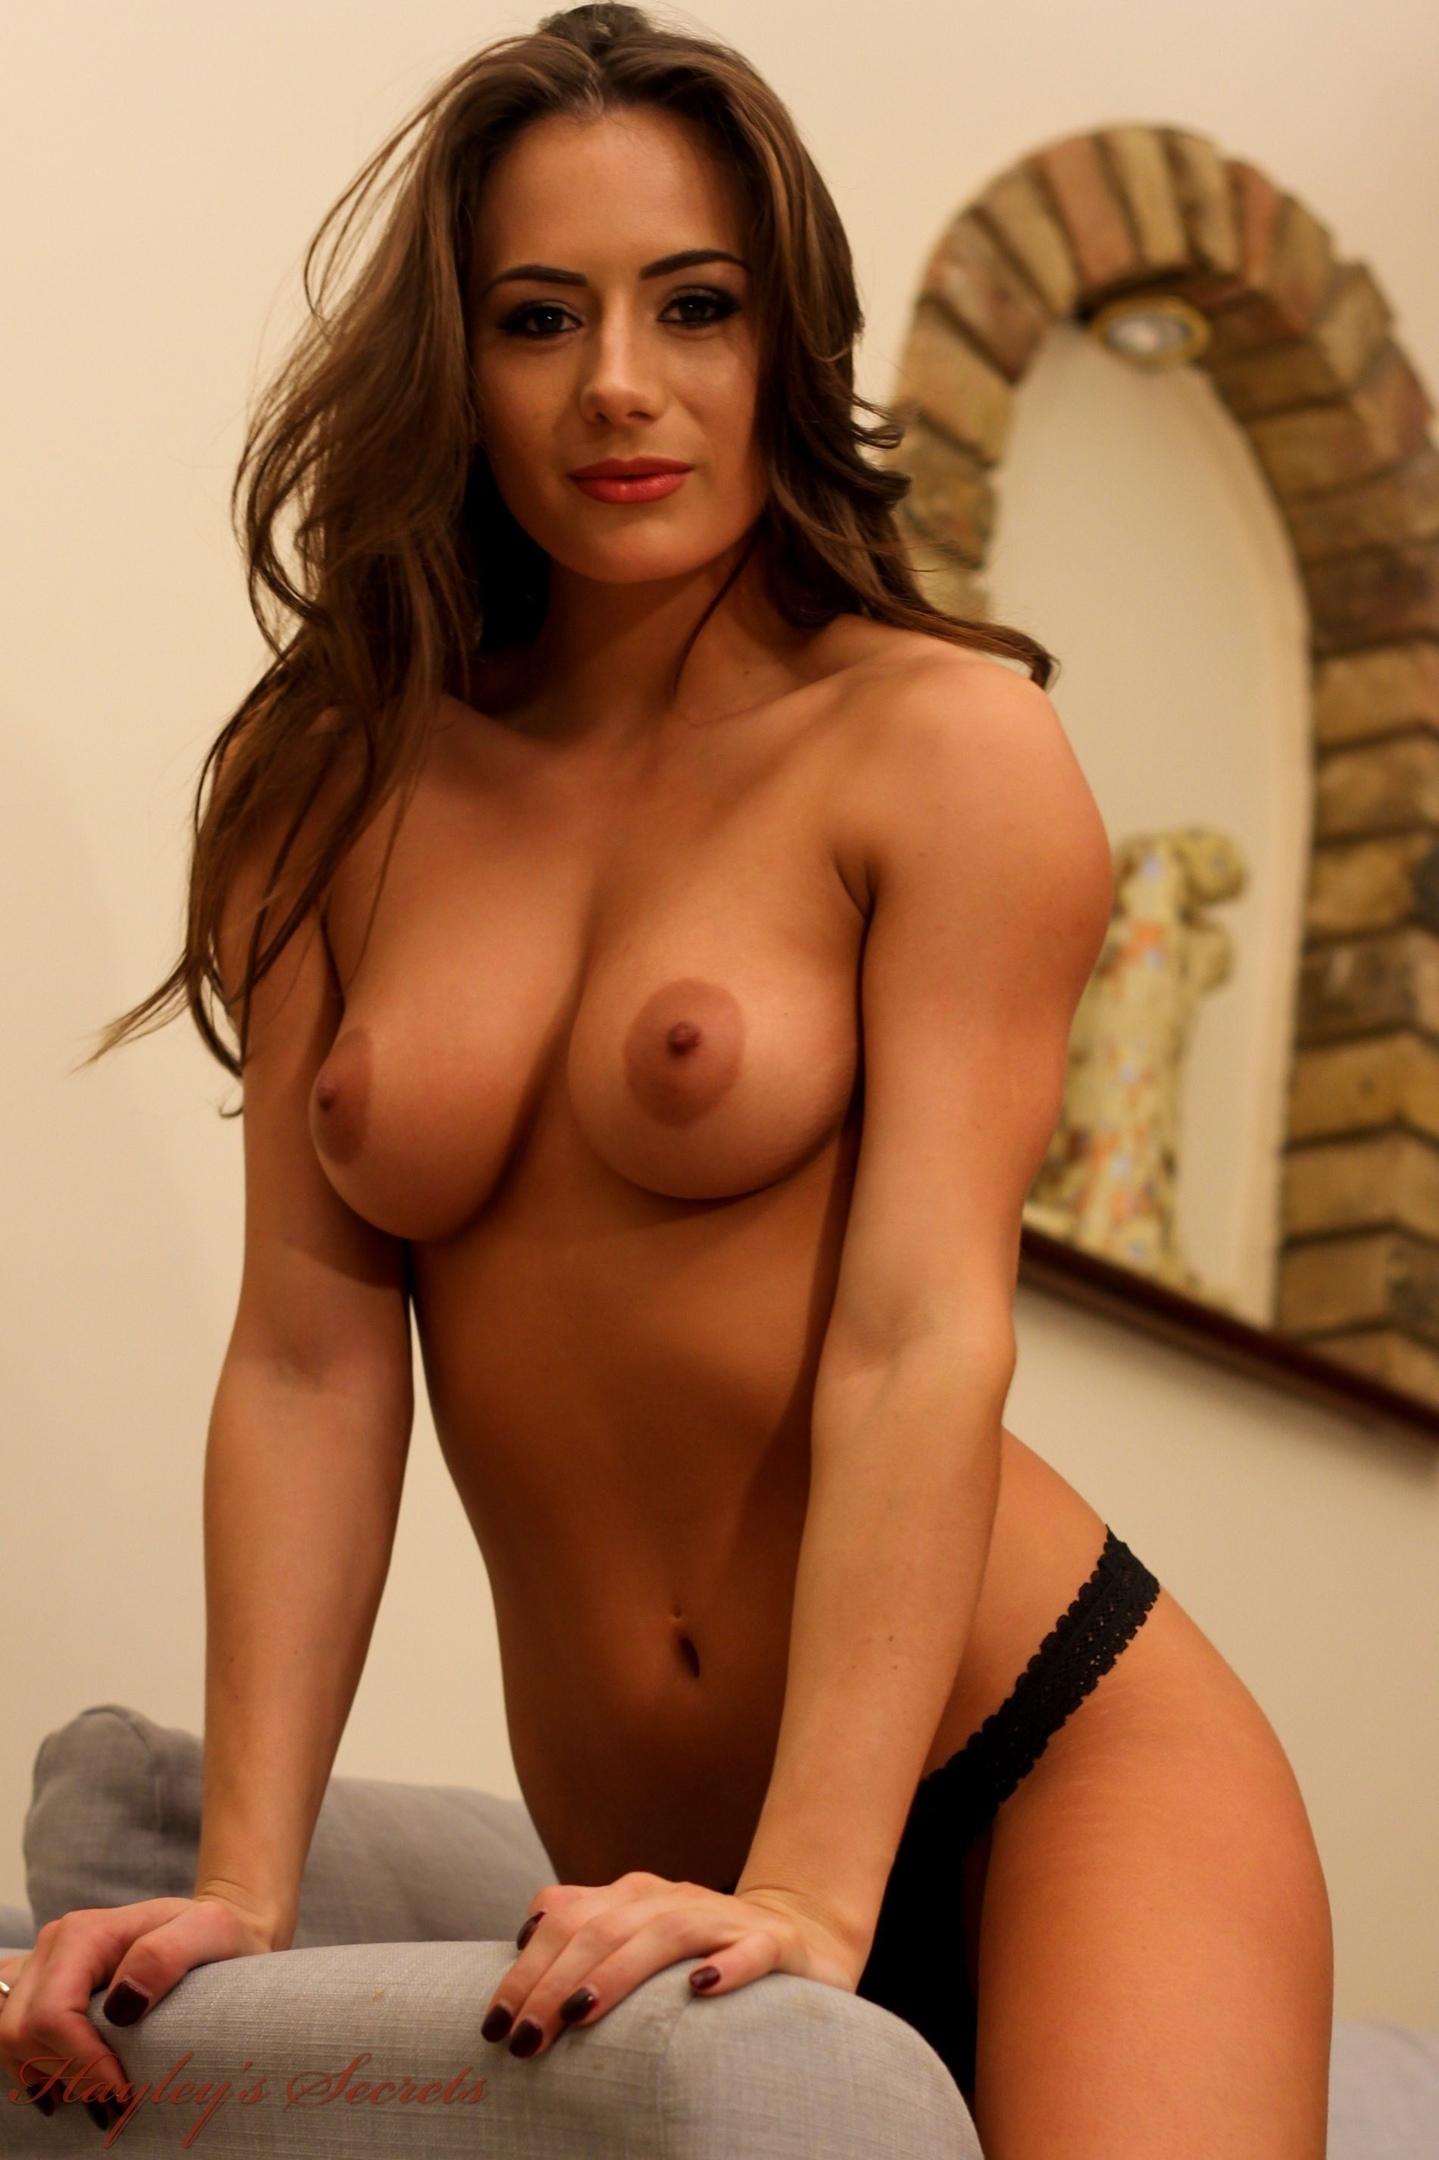 Laura inn topless — photo 9